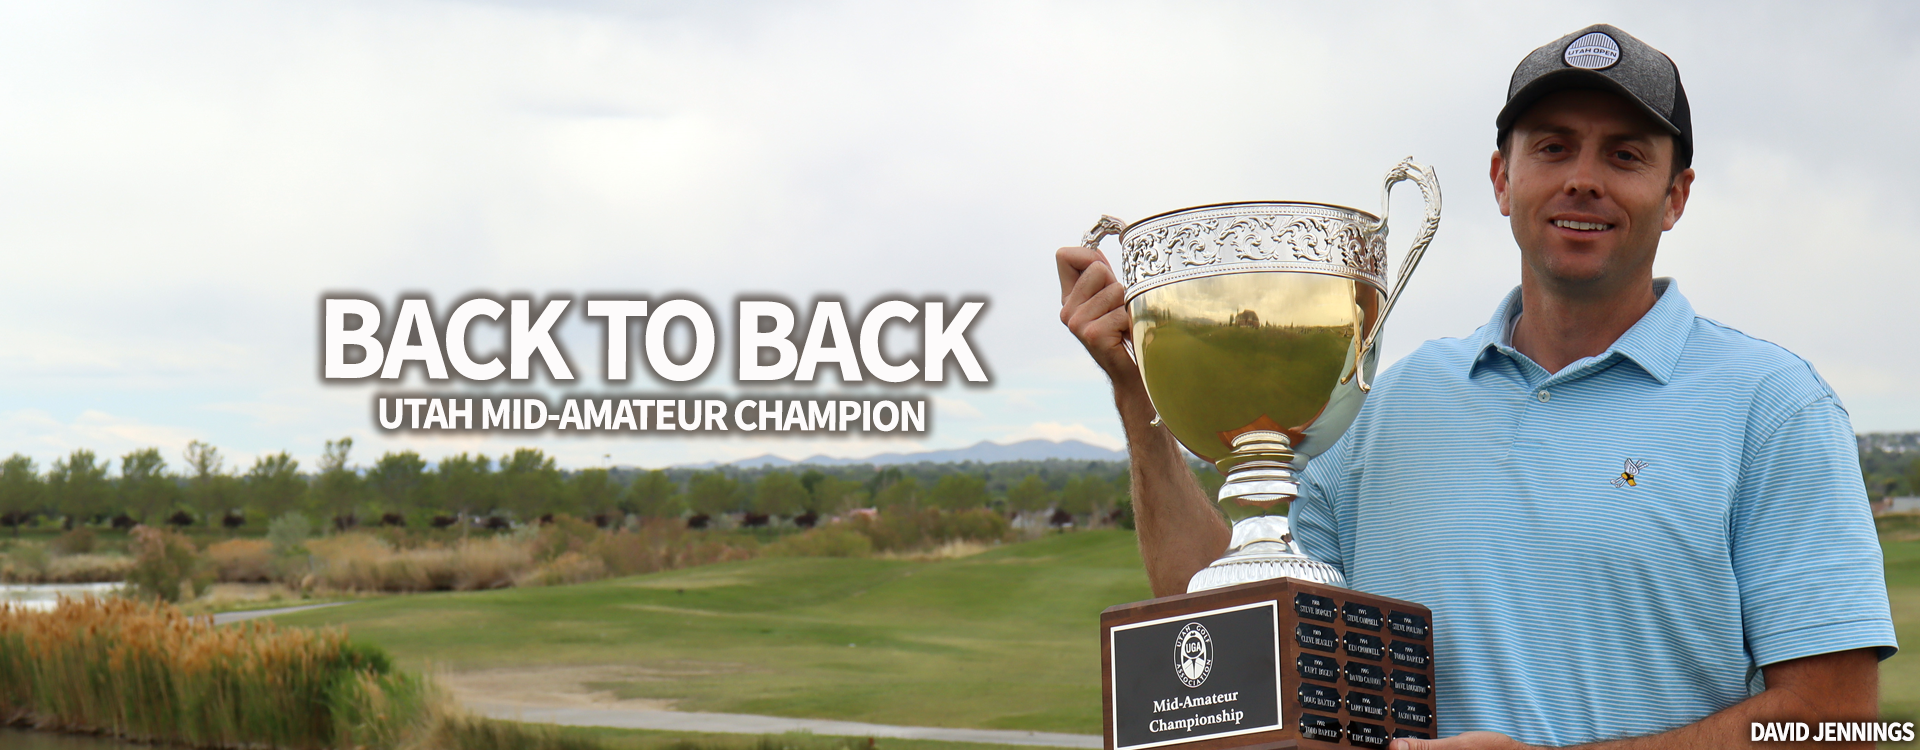 Back-to-Back-Utah-Mid-Champion-David-Jennings